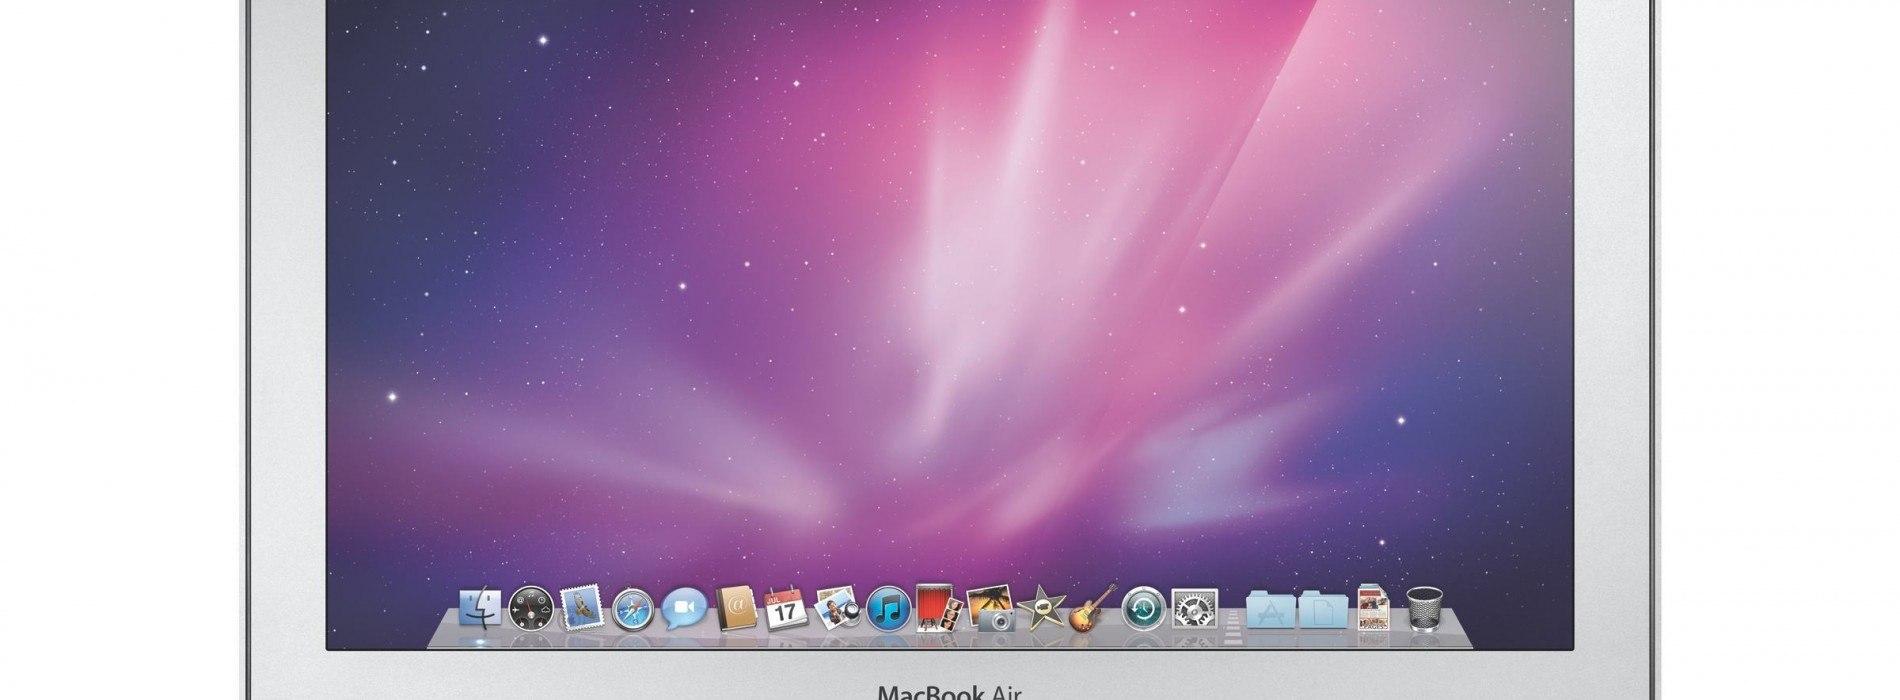 Apple Macbook Air 11.6″ Late 2010